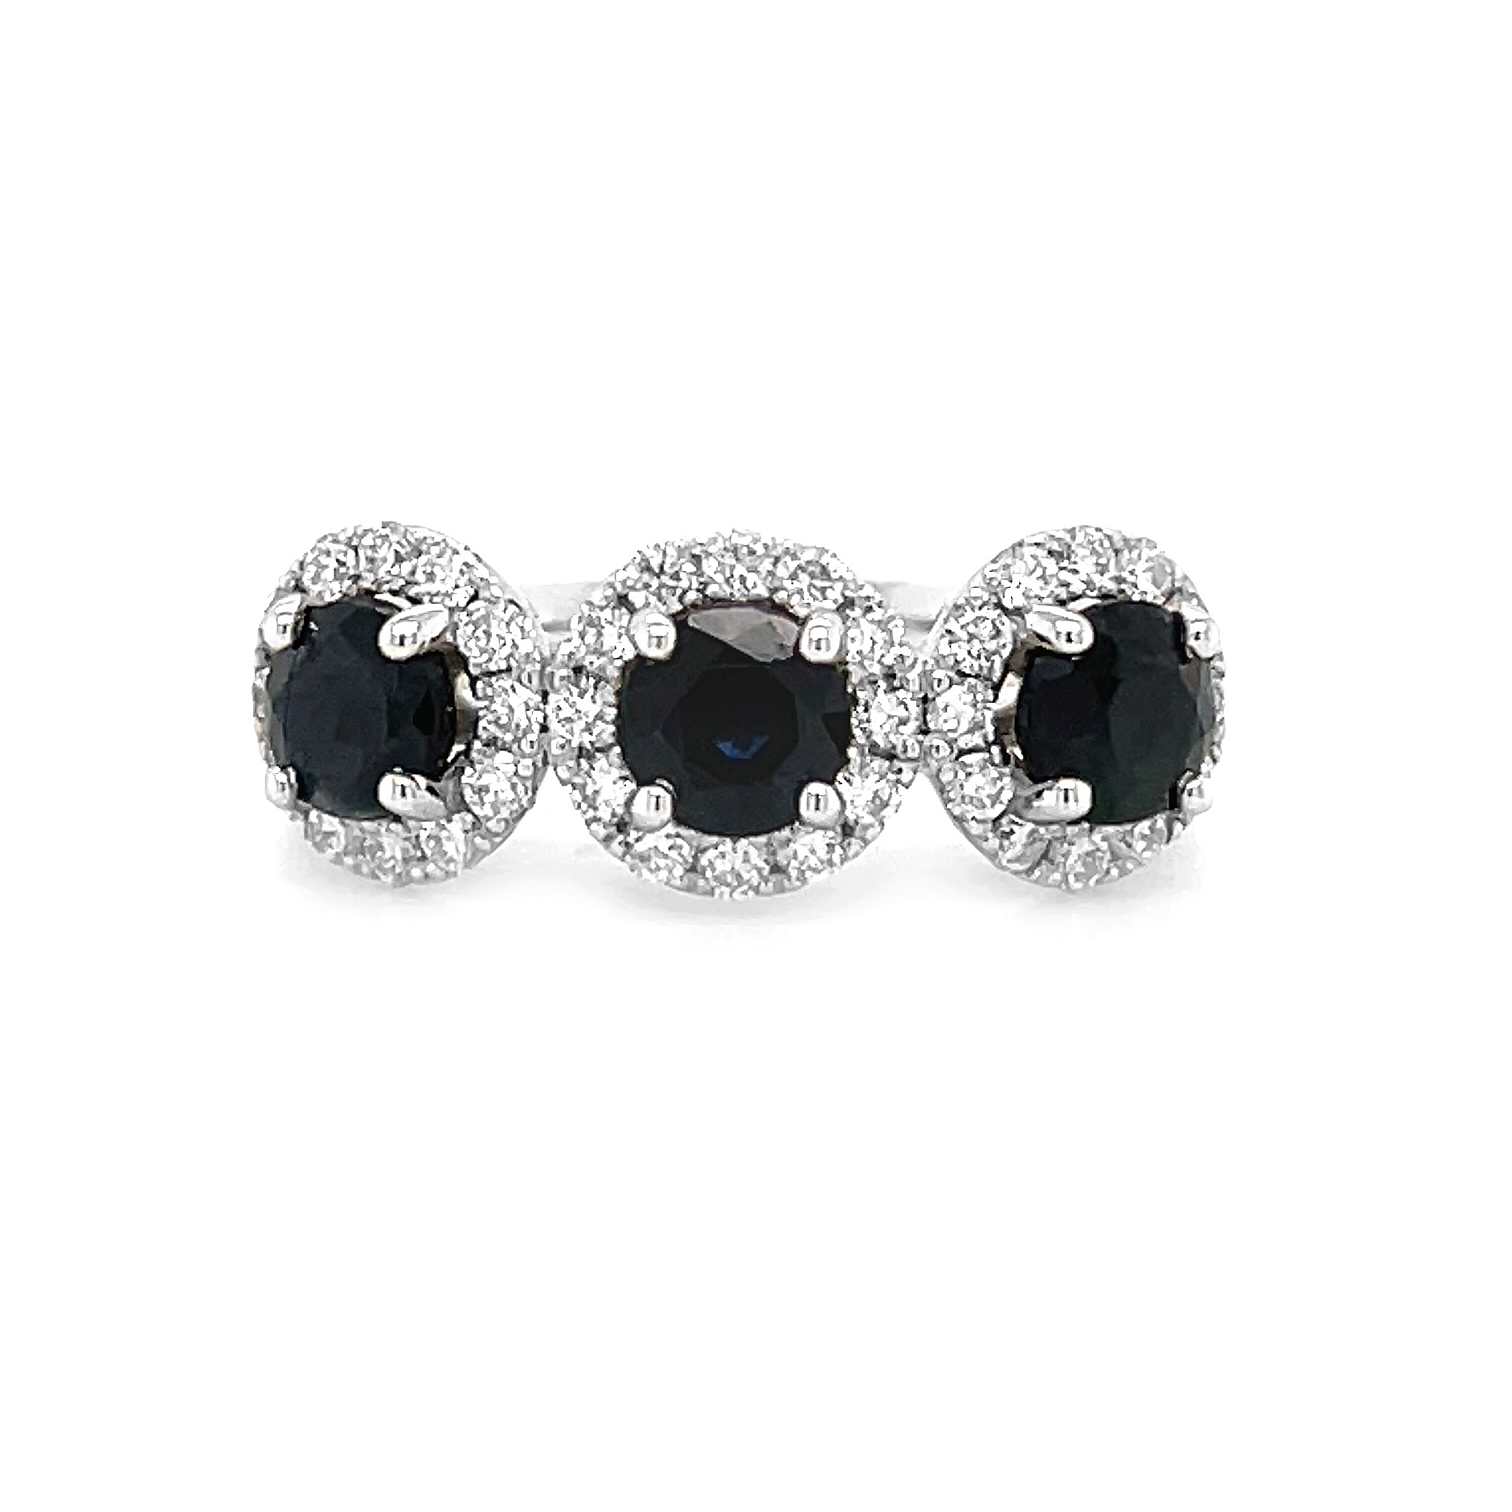 18k White Gold Dark Sapphire & Brilliant Cut Diamond Treble Cluster Ring